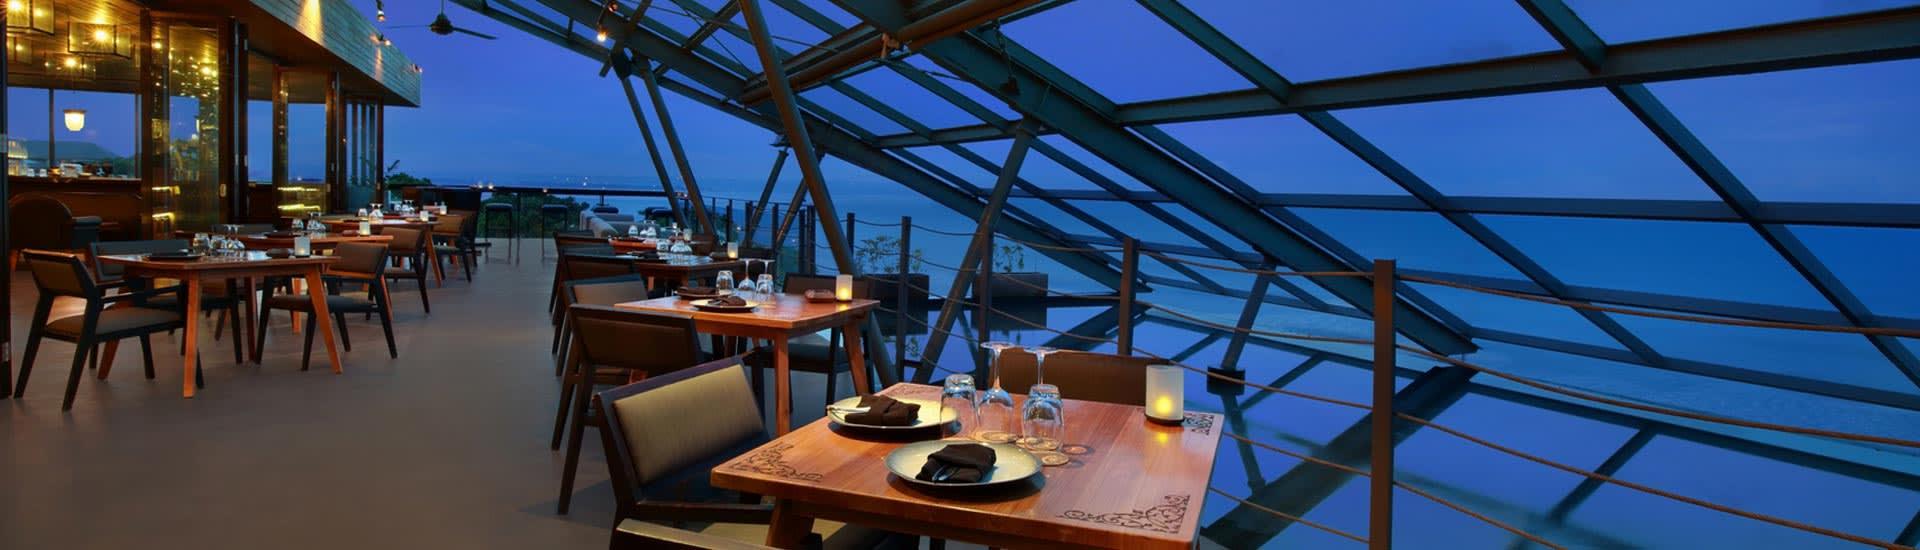 Seminyak Bali Restaurants   Anantara Seminyak Moonlight Kitchen